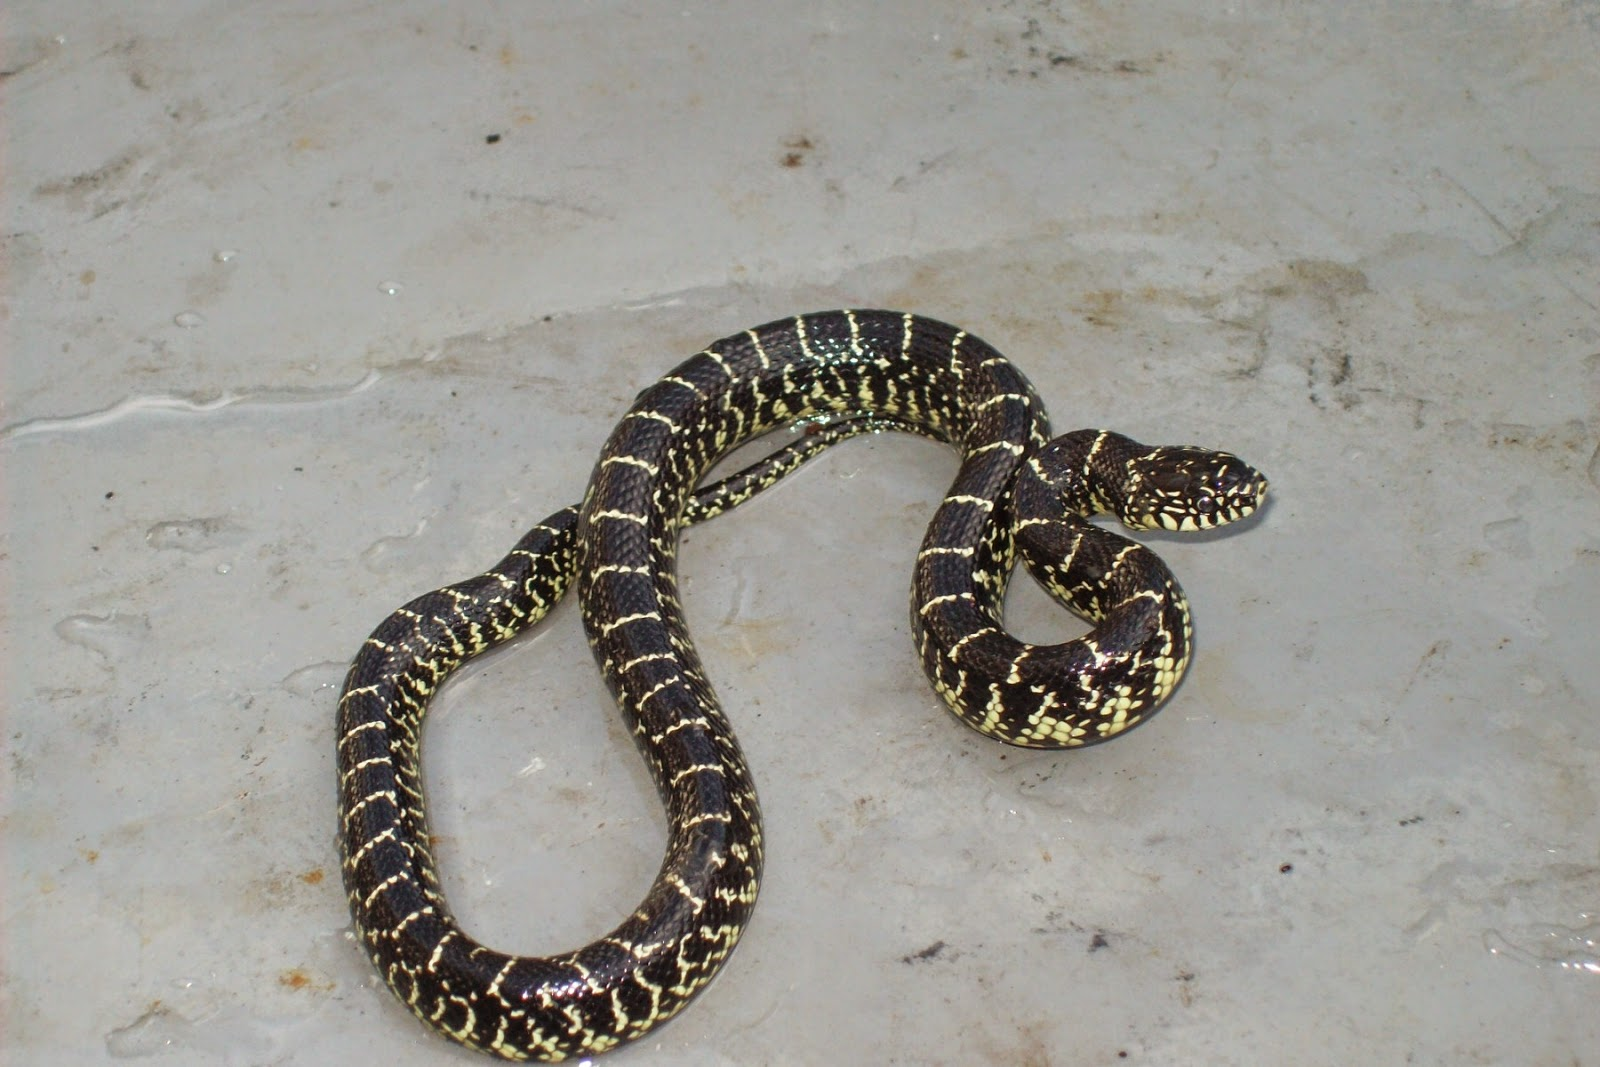 living alongside wildlife readers write in a mixed bag of snake